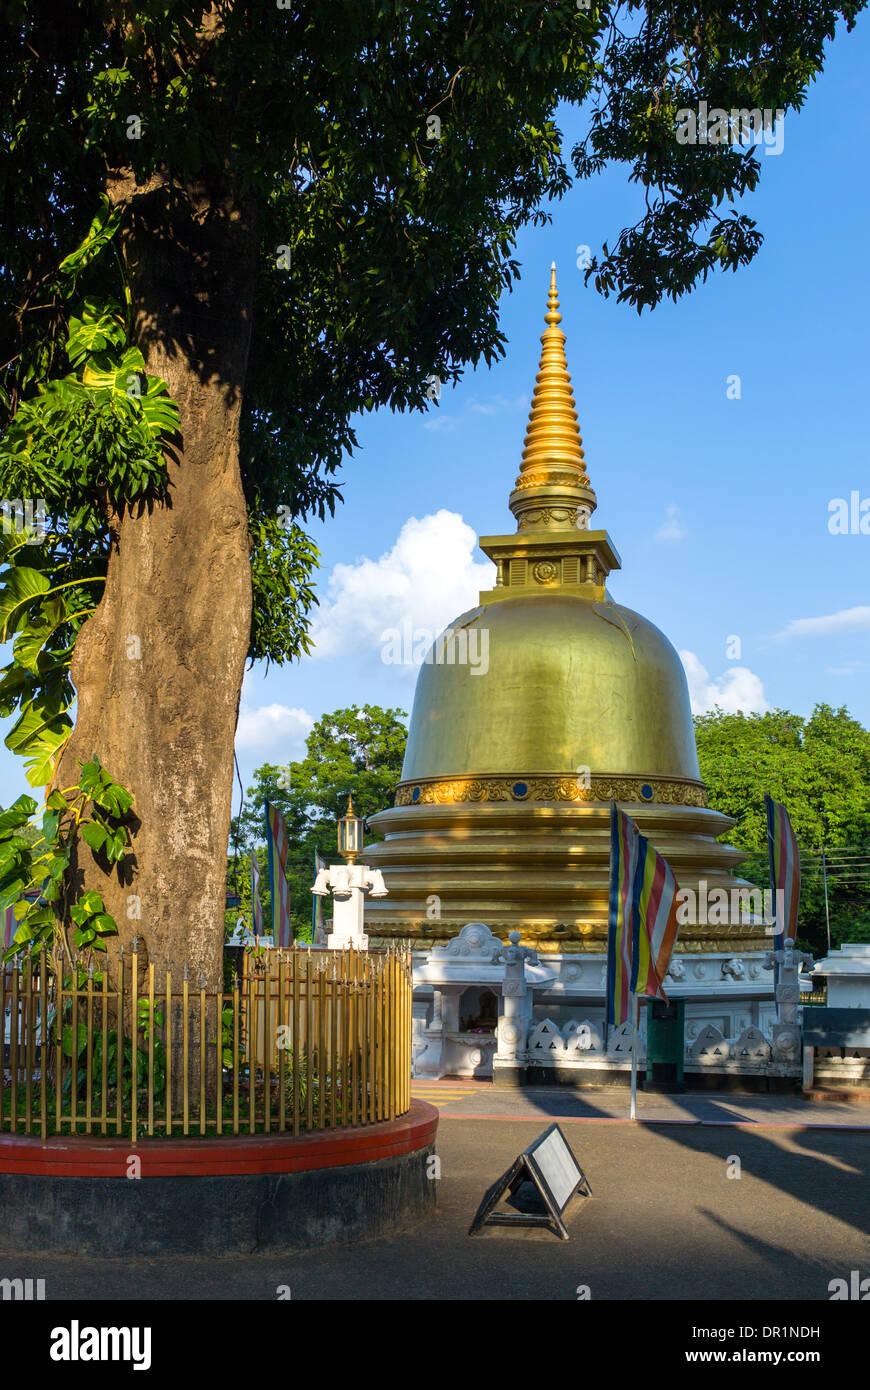 Sri Lanka, Danbulla, a stupa at the entrance of the Golden Temple Stock Photo